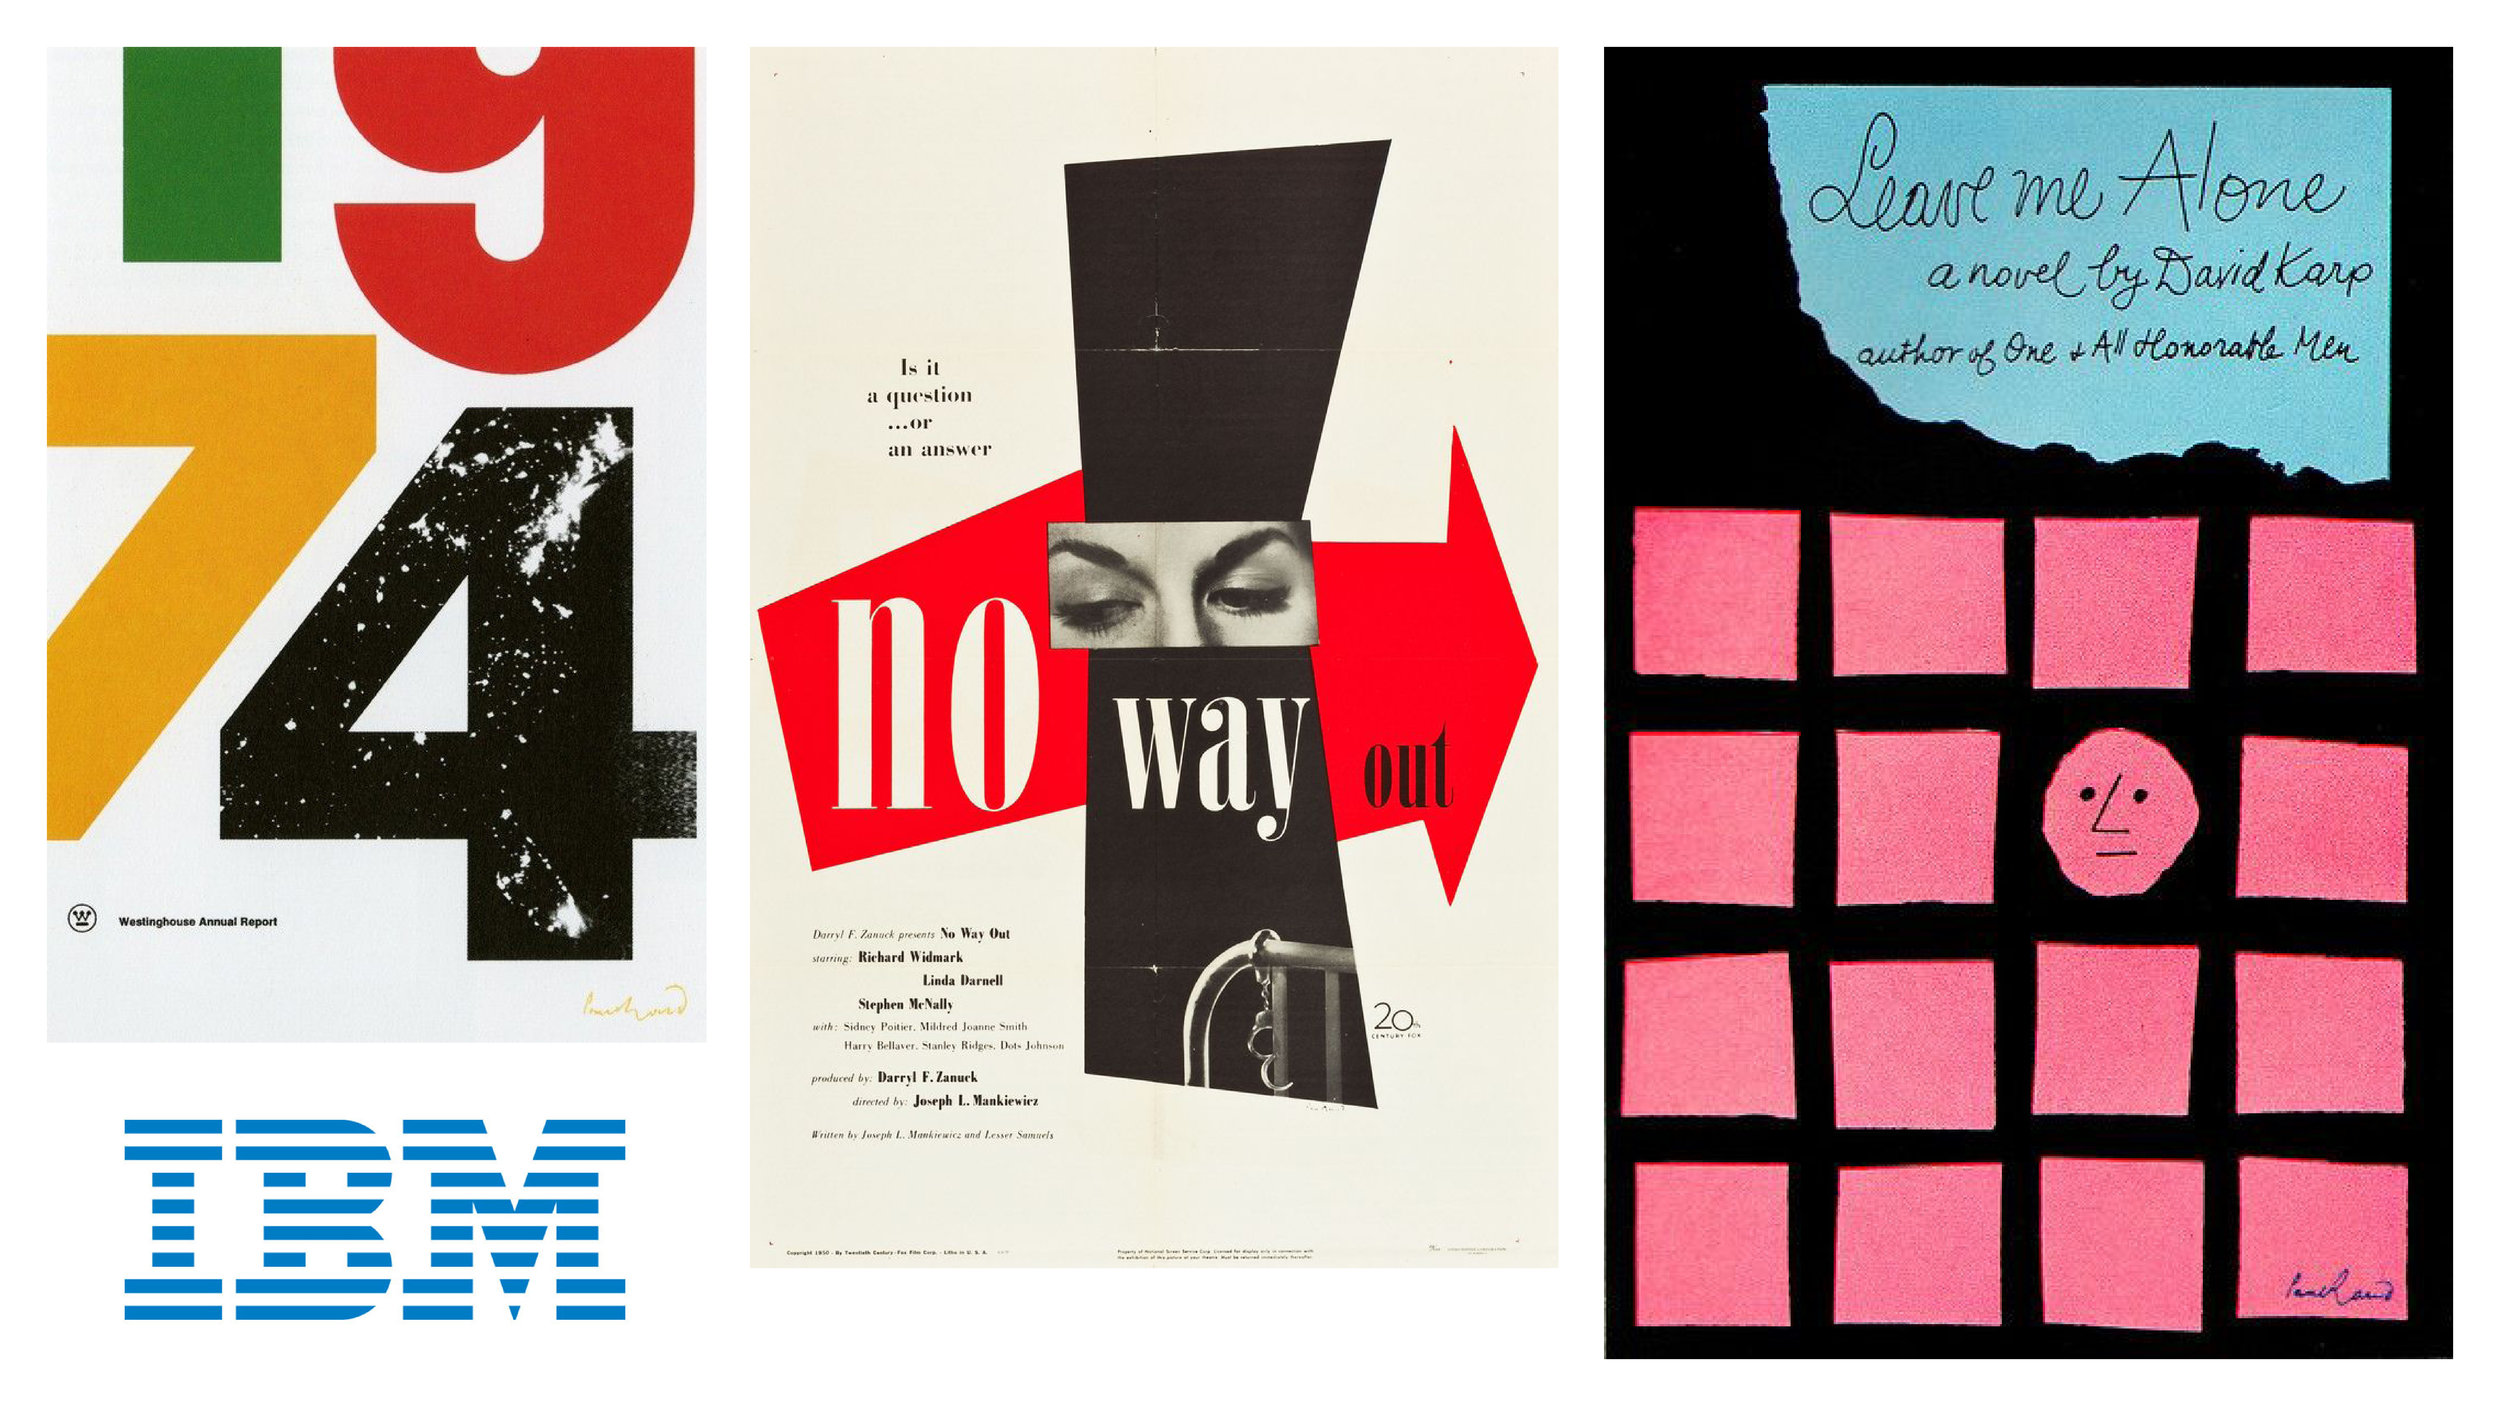 161116 The Design Process - Basic Graphic Design2.jpg